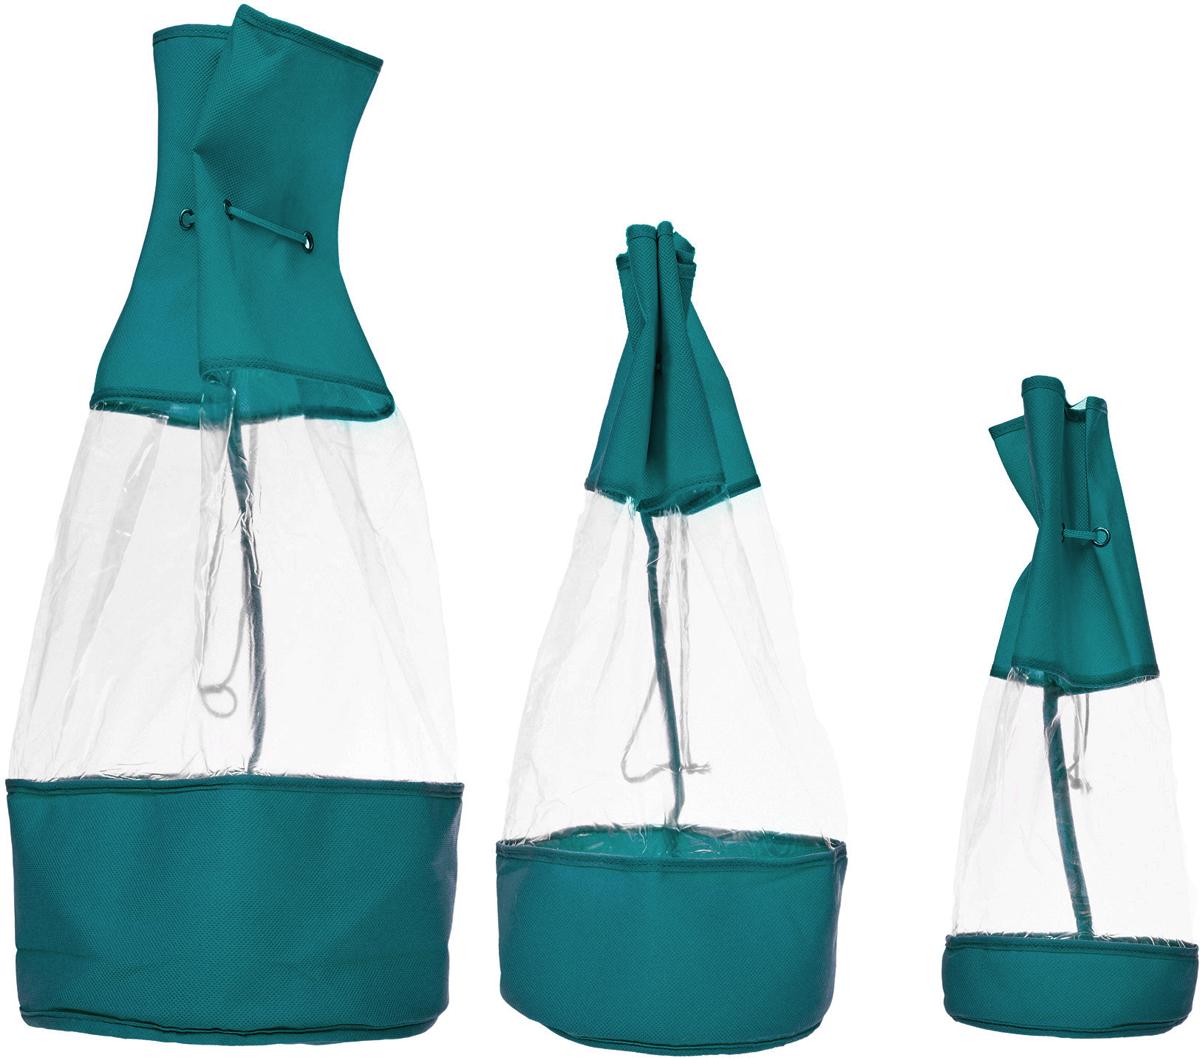 Набор мешочков Все на местах Minimalistic, цвет: бирюзовый, 3 предмета набор мешочков для завтрака paclan 17 см х 24 см 50 шт